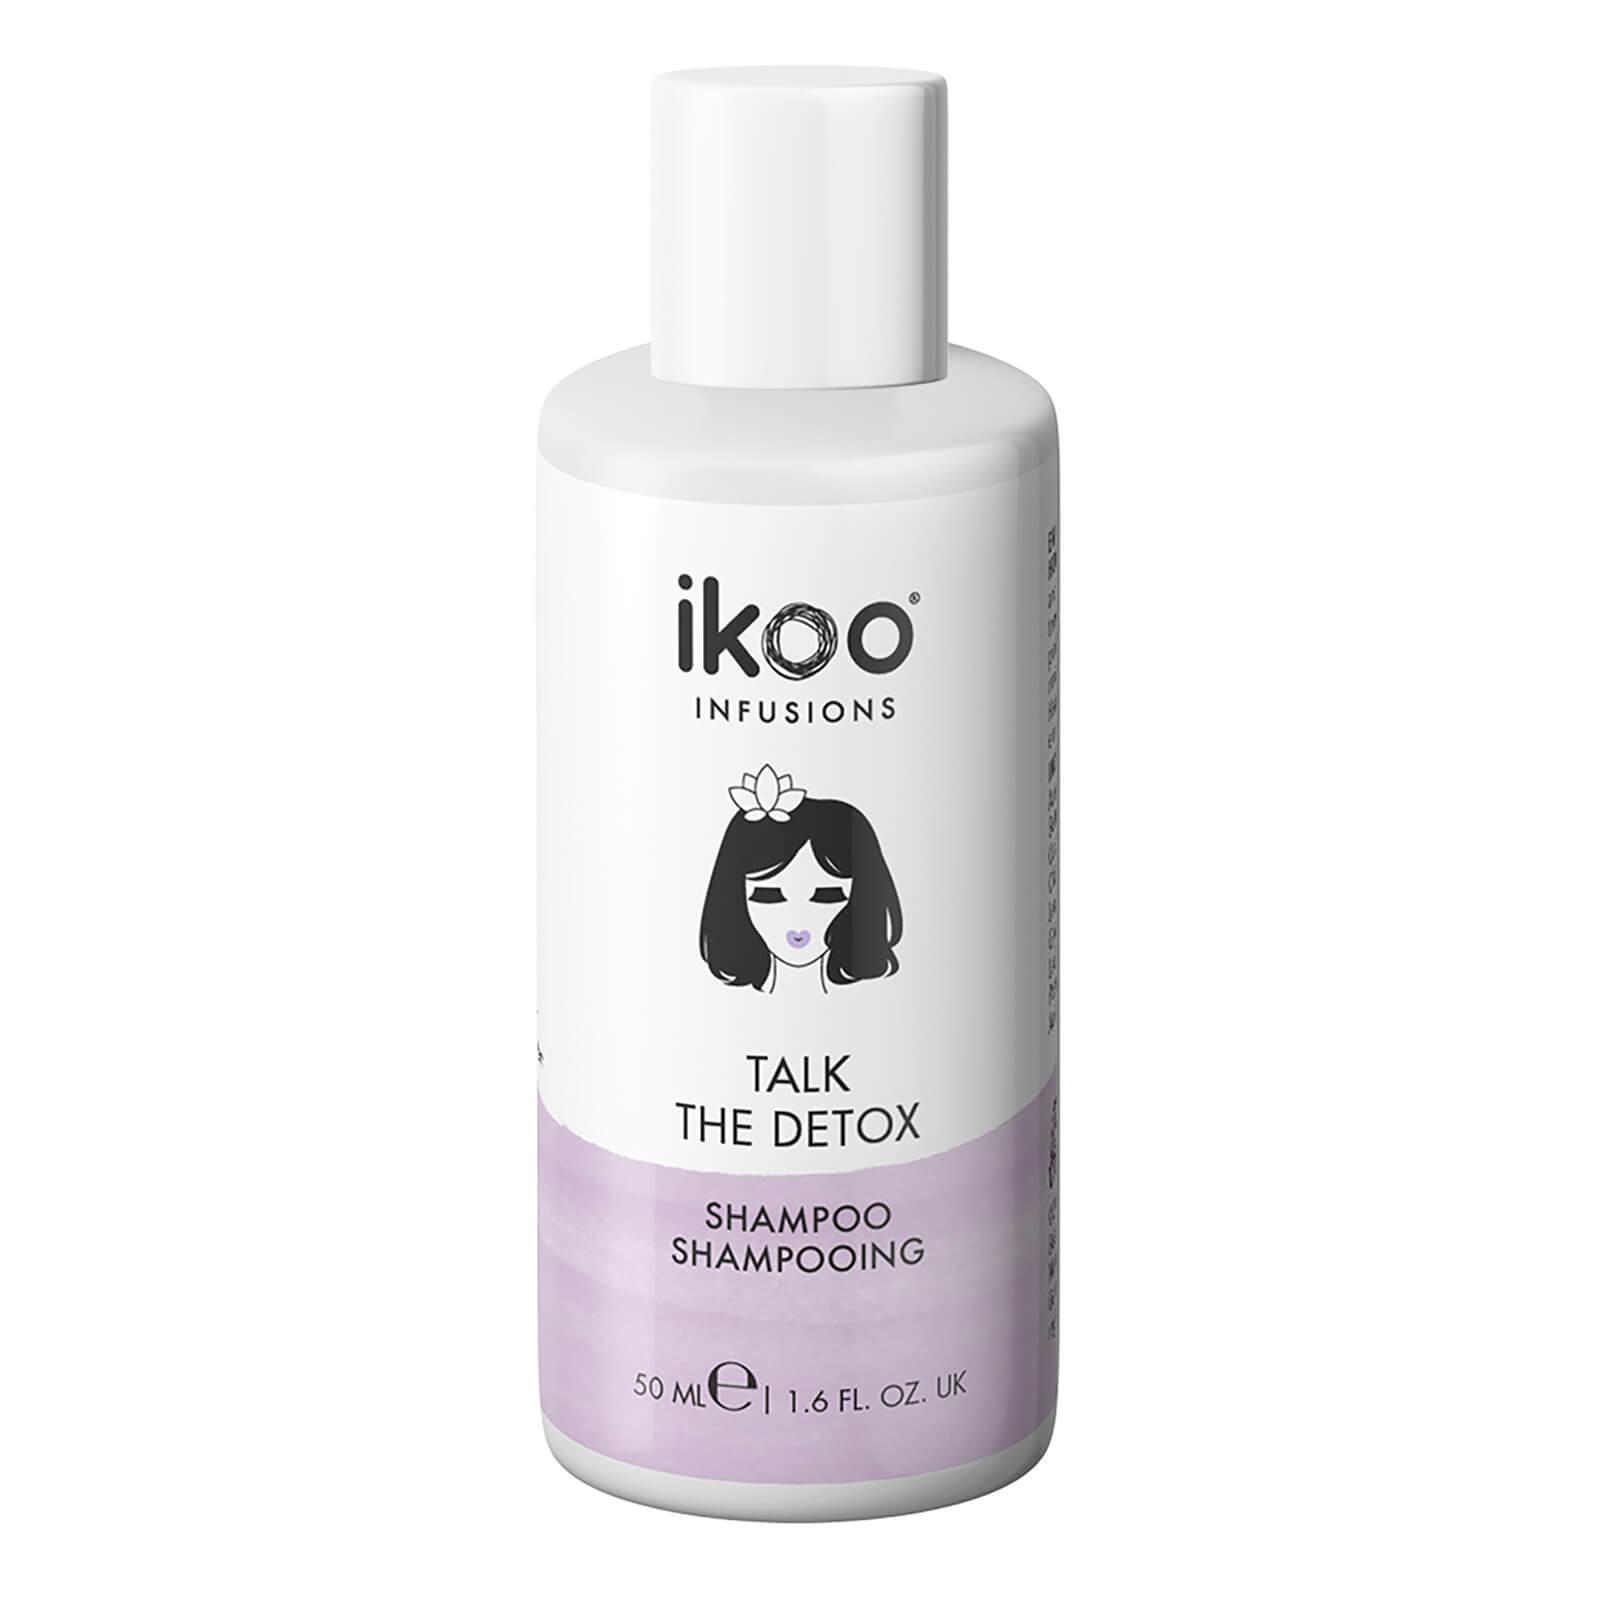 Ikoo Shampoo - Talk the Detox 50ml  - Купить